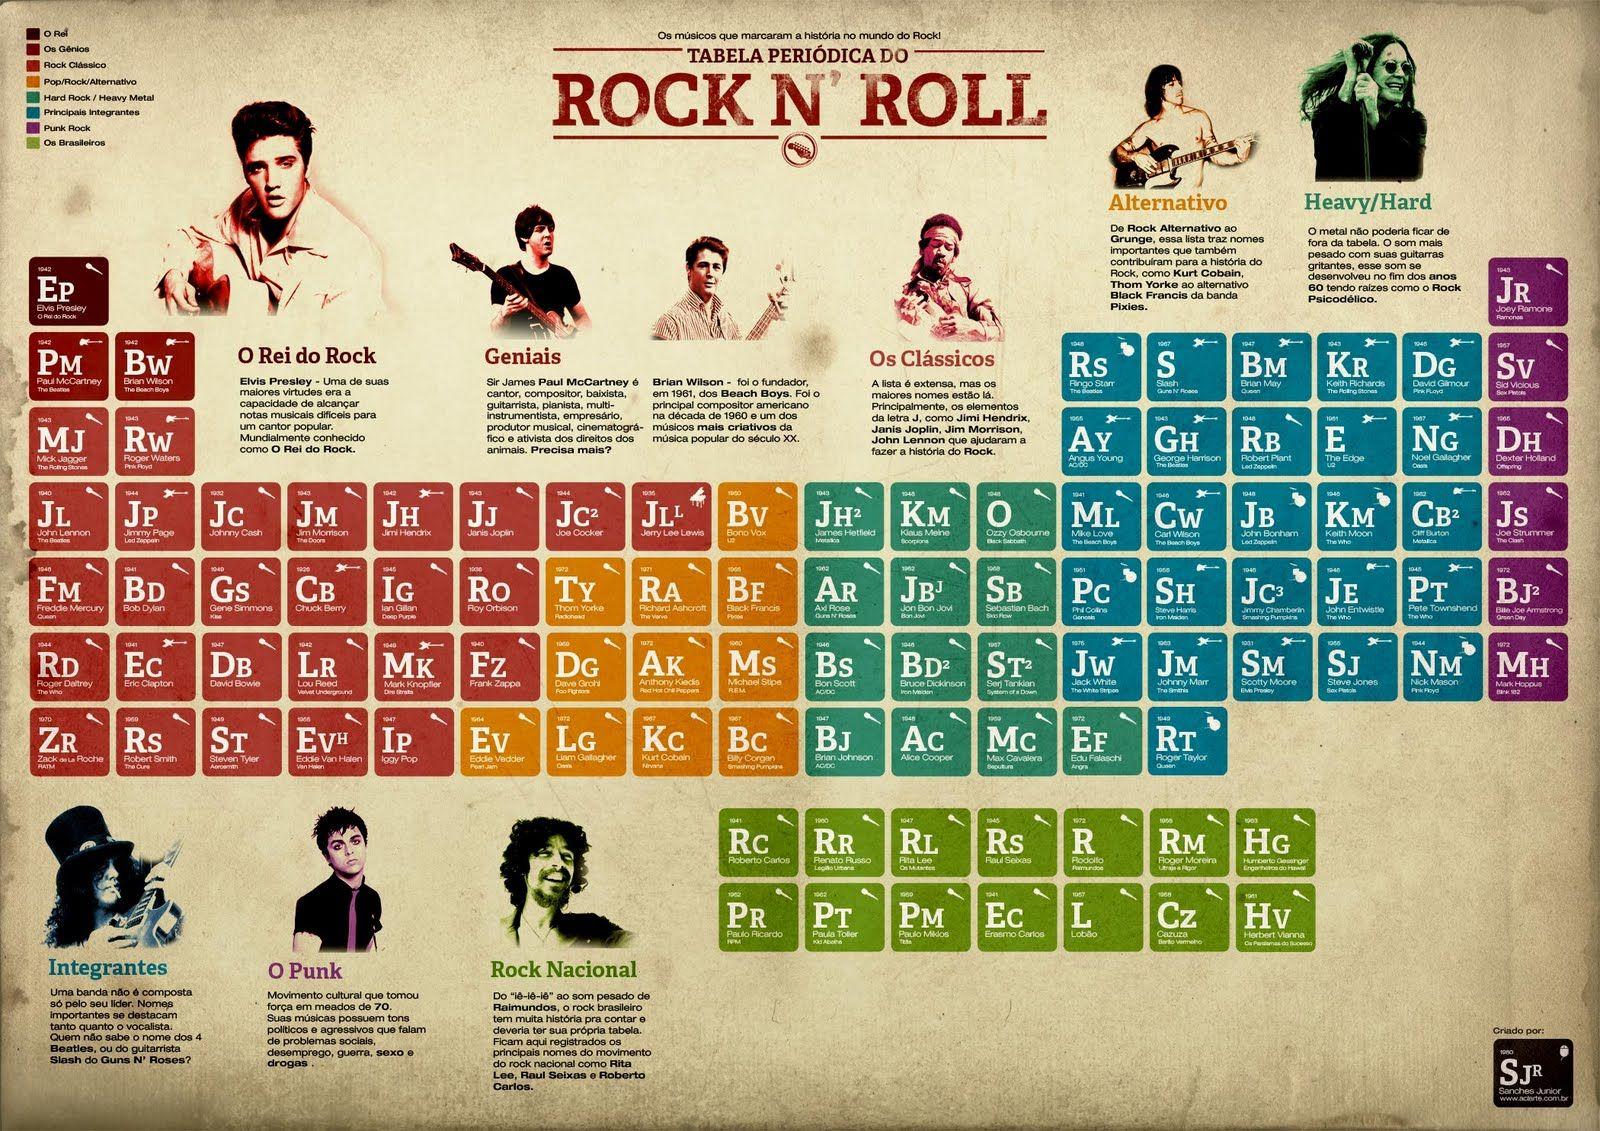 Rockn roll periodic table rockn roll pinterest rock n roll rockn roll periodic table gamestrikefo Gallery